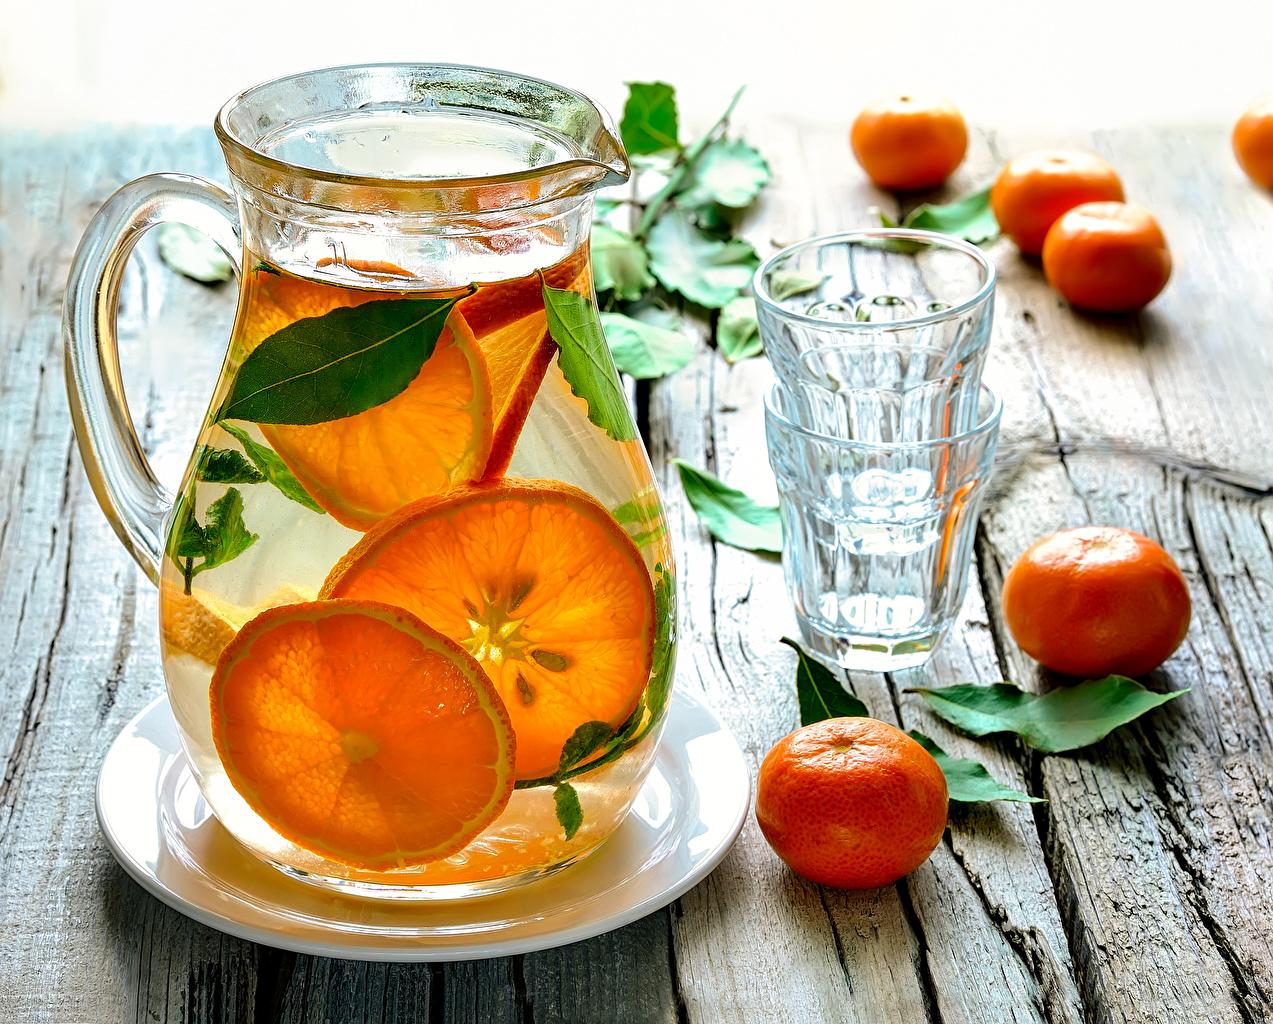 Картинки Лимонад Мандарины Стакан Кувшин Еда Доски Напитки Пища Продукты питания